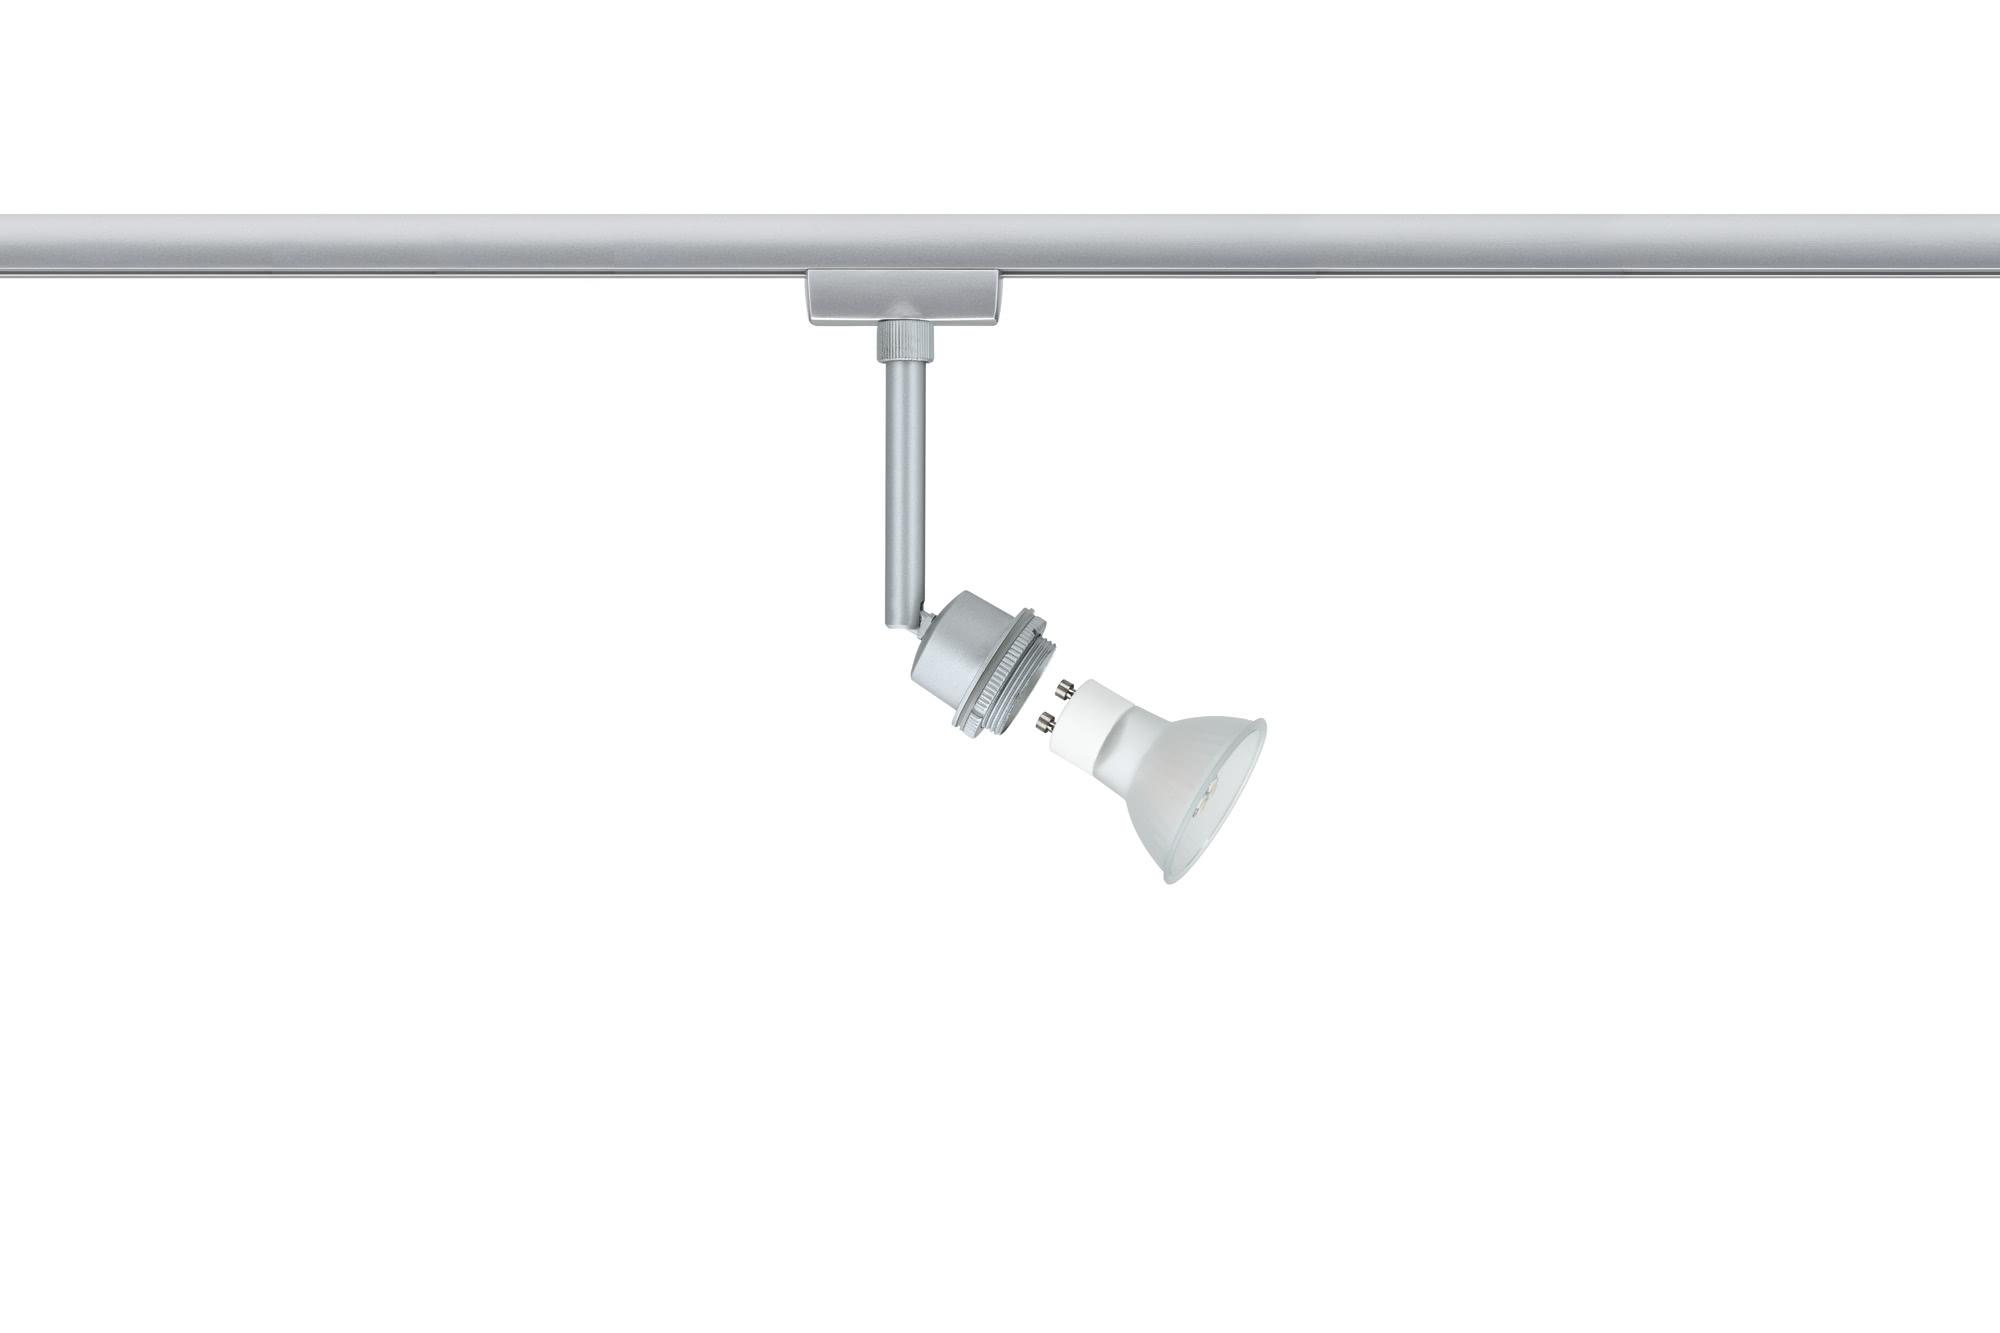 Paulmann. 95182 Светильник URail LED Spot 1x3,5W GZ10, хром матовый